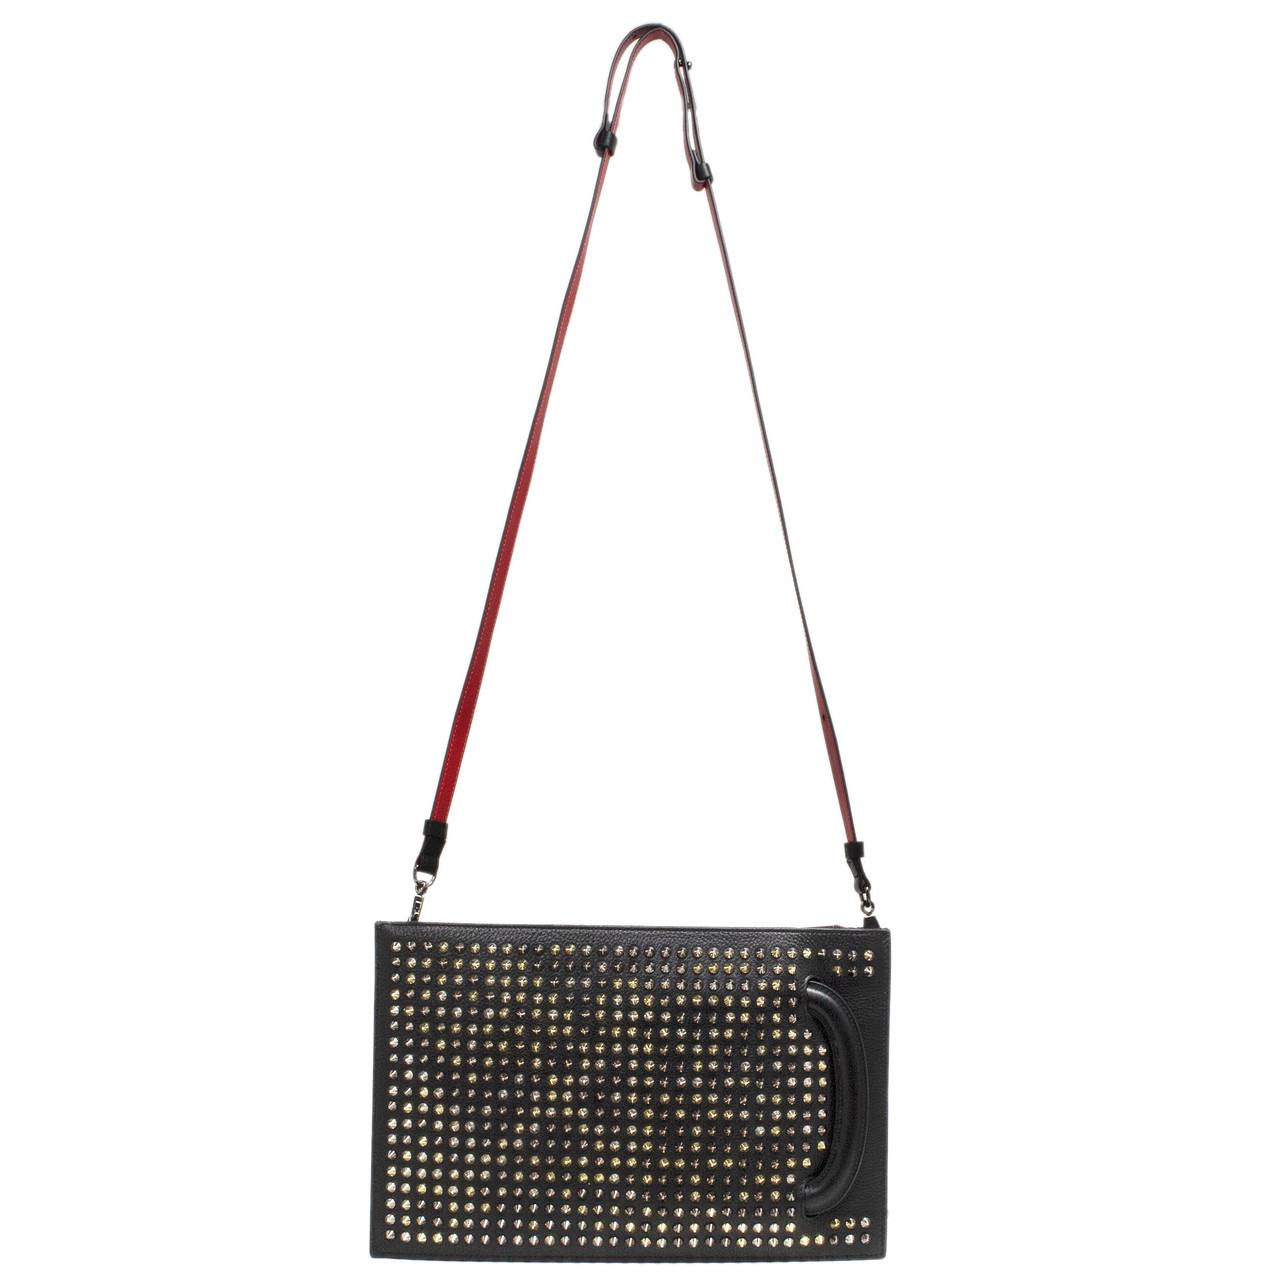 371d6e9a55a Christian Louboutin Trictrac Small Portfolio Bag